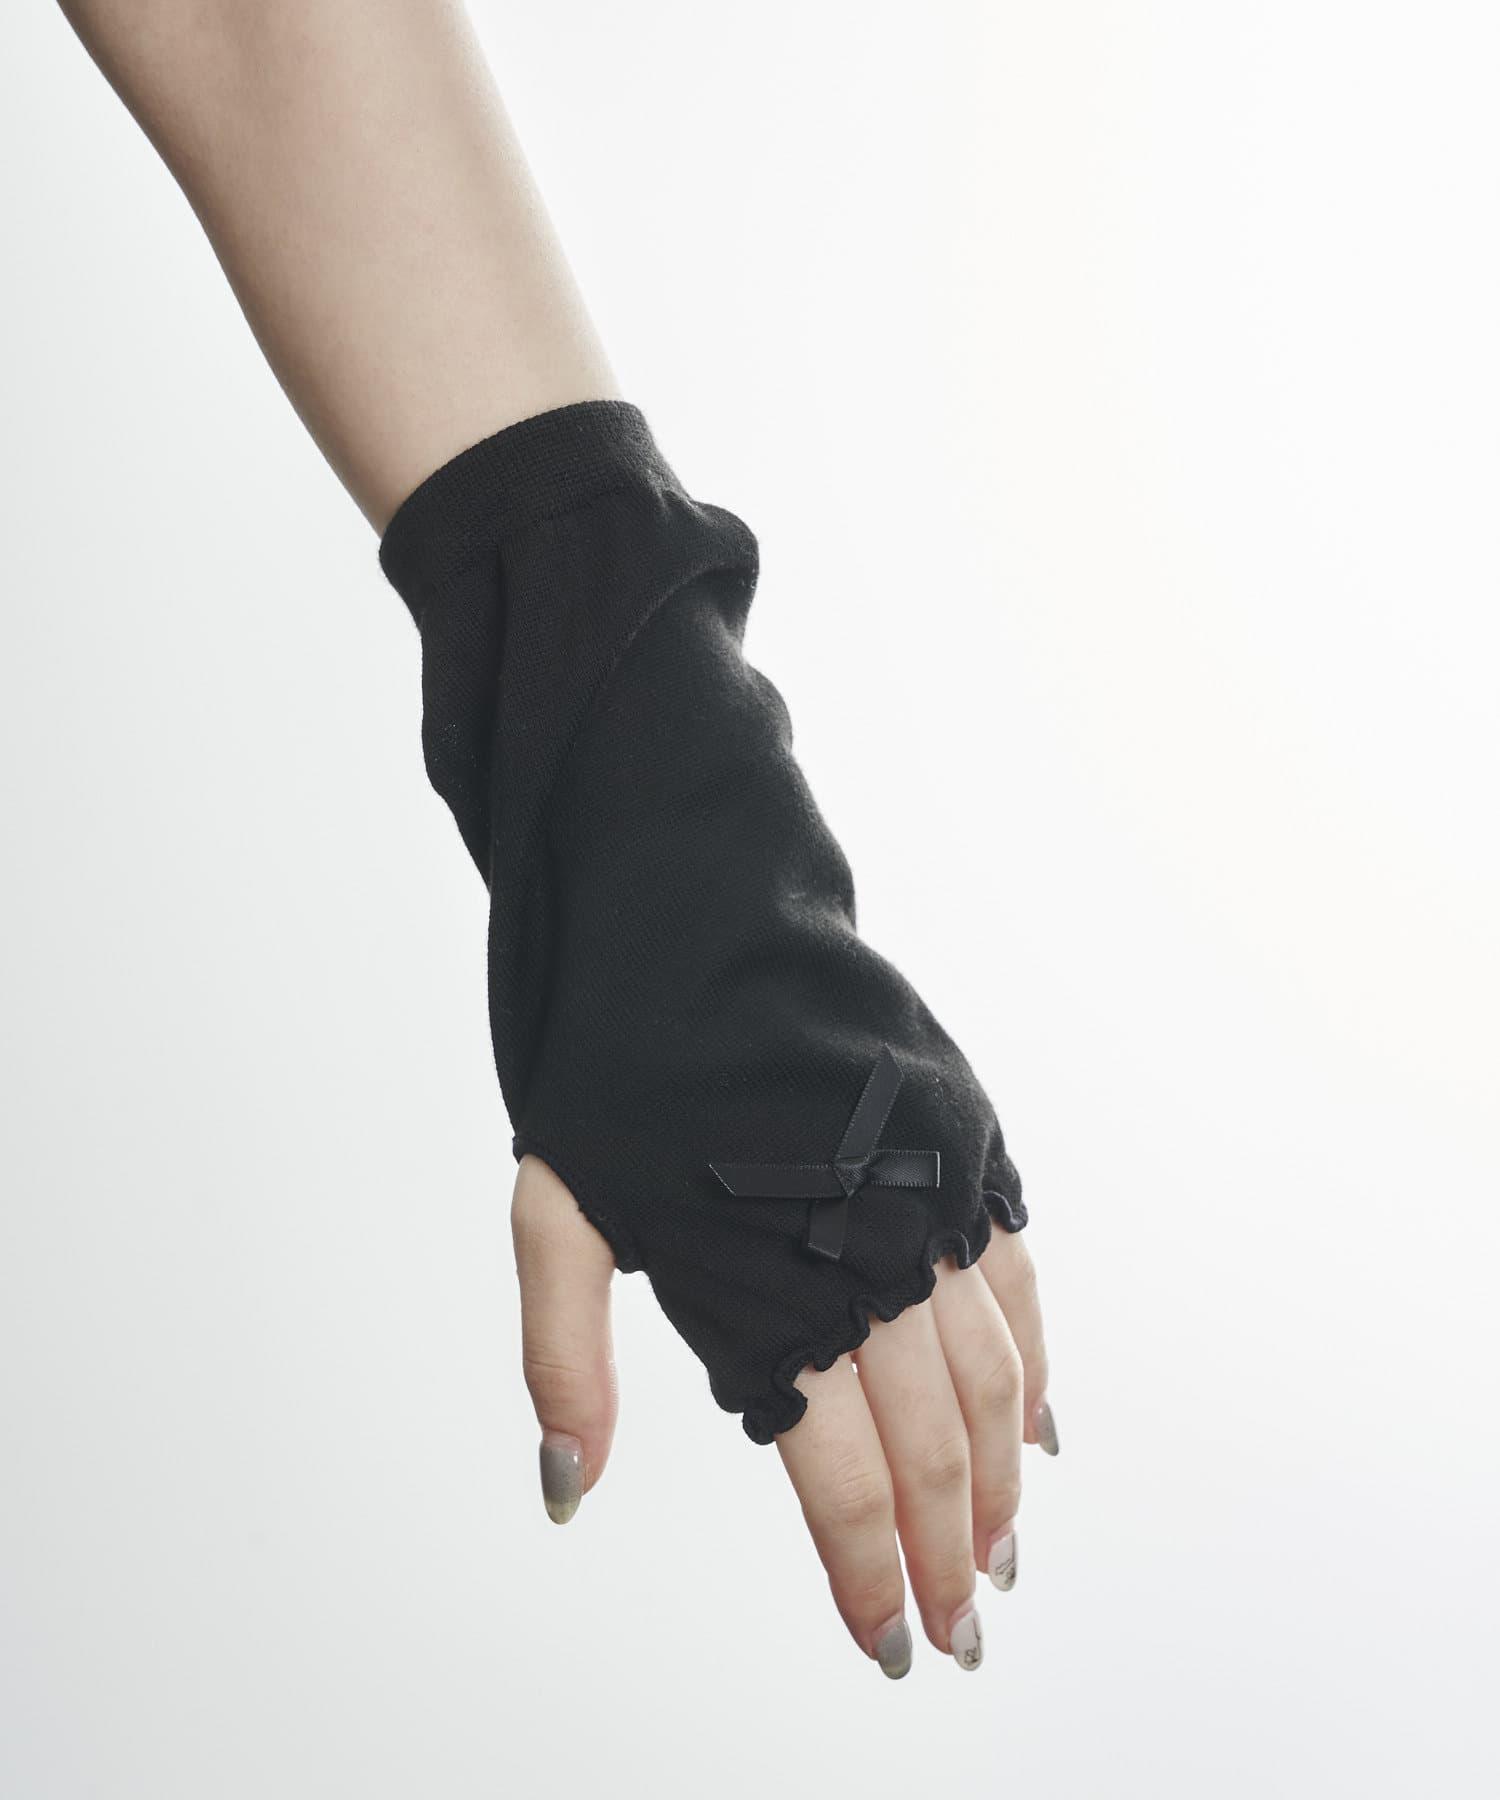 3COINS(スリーコインズ) ライフスタイル 【快適な日差し対策】冷感リボン付きアームカバーショート丈 ブラック